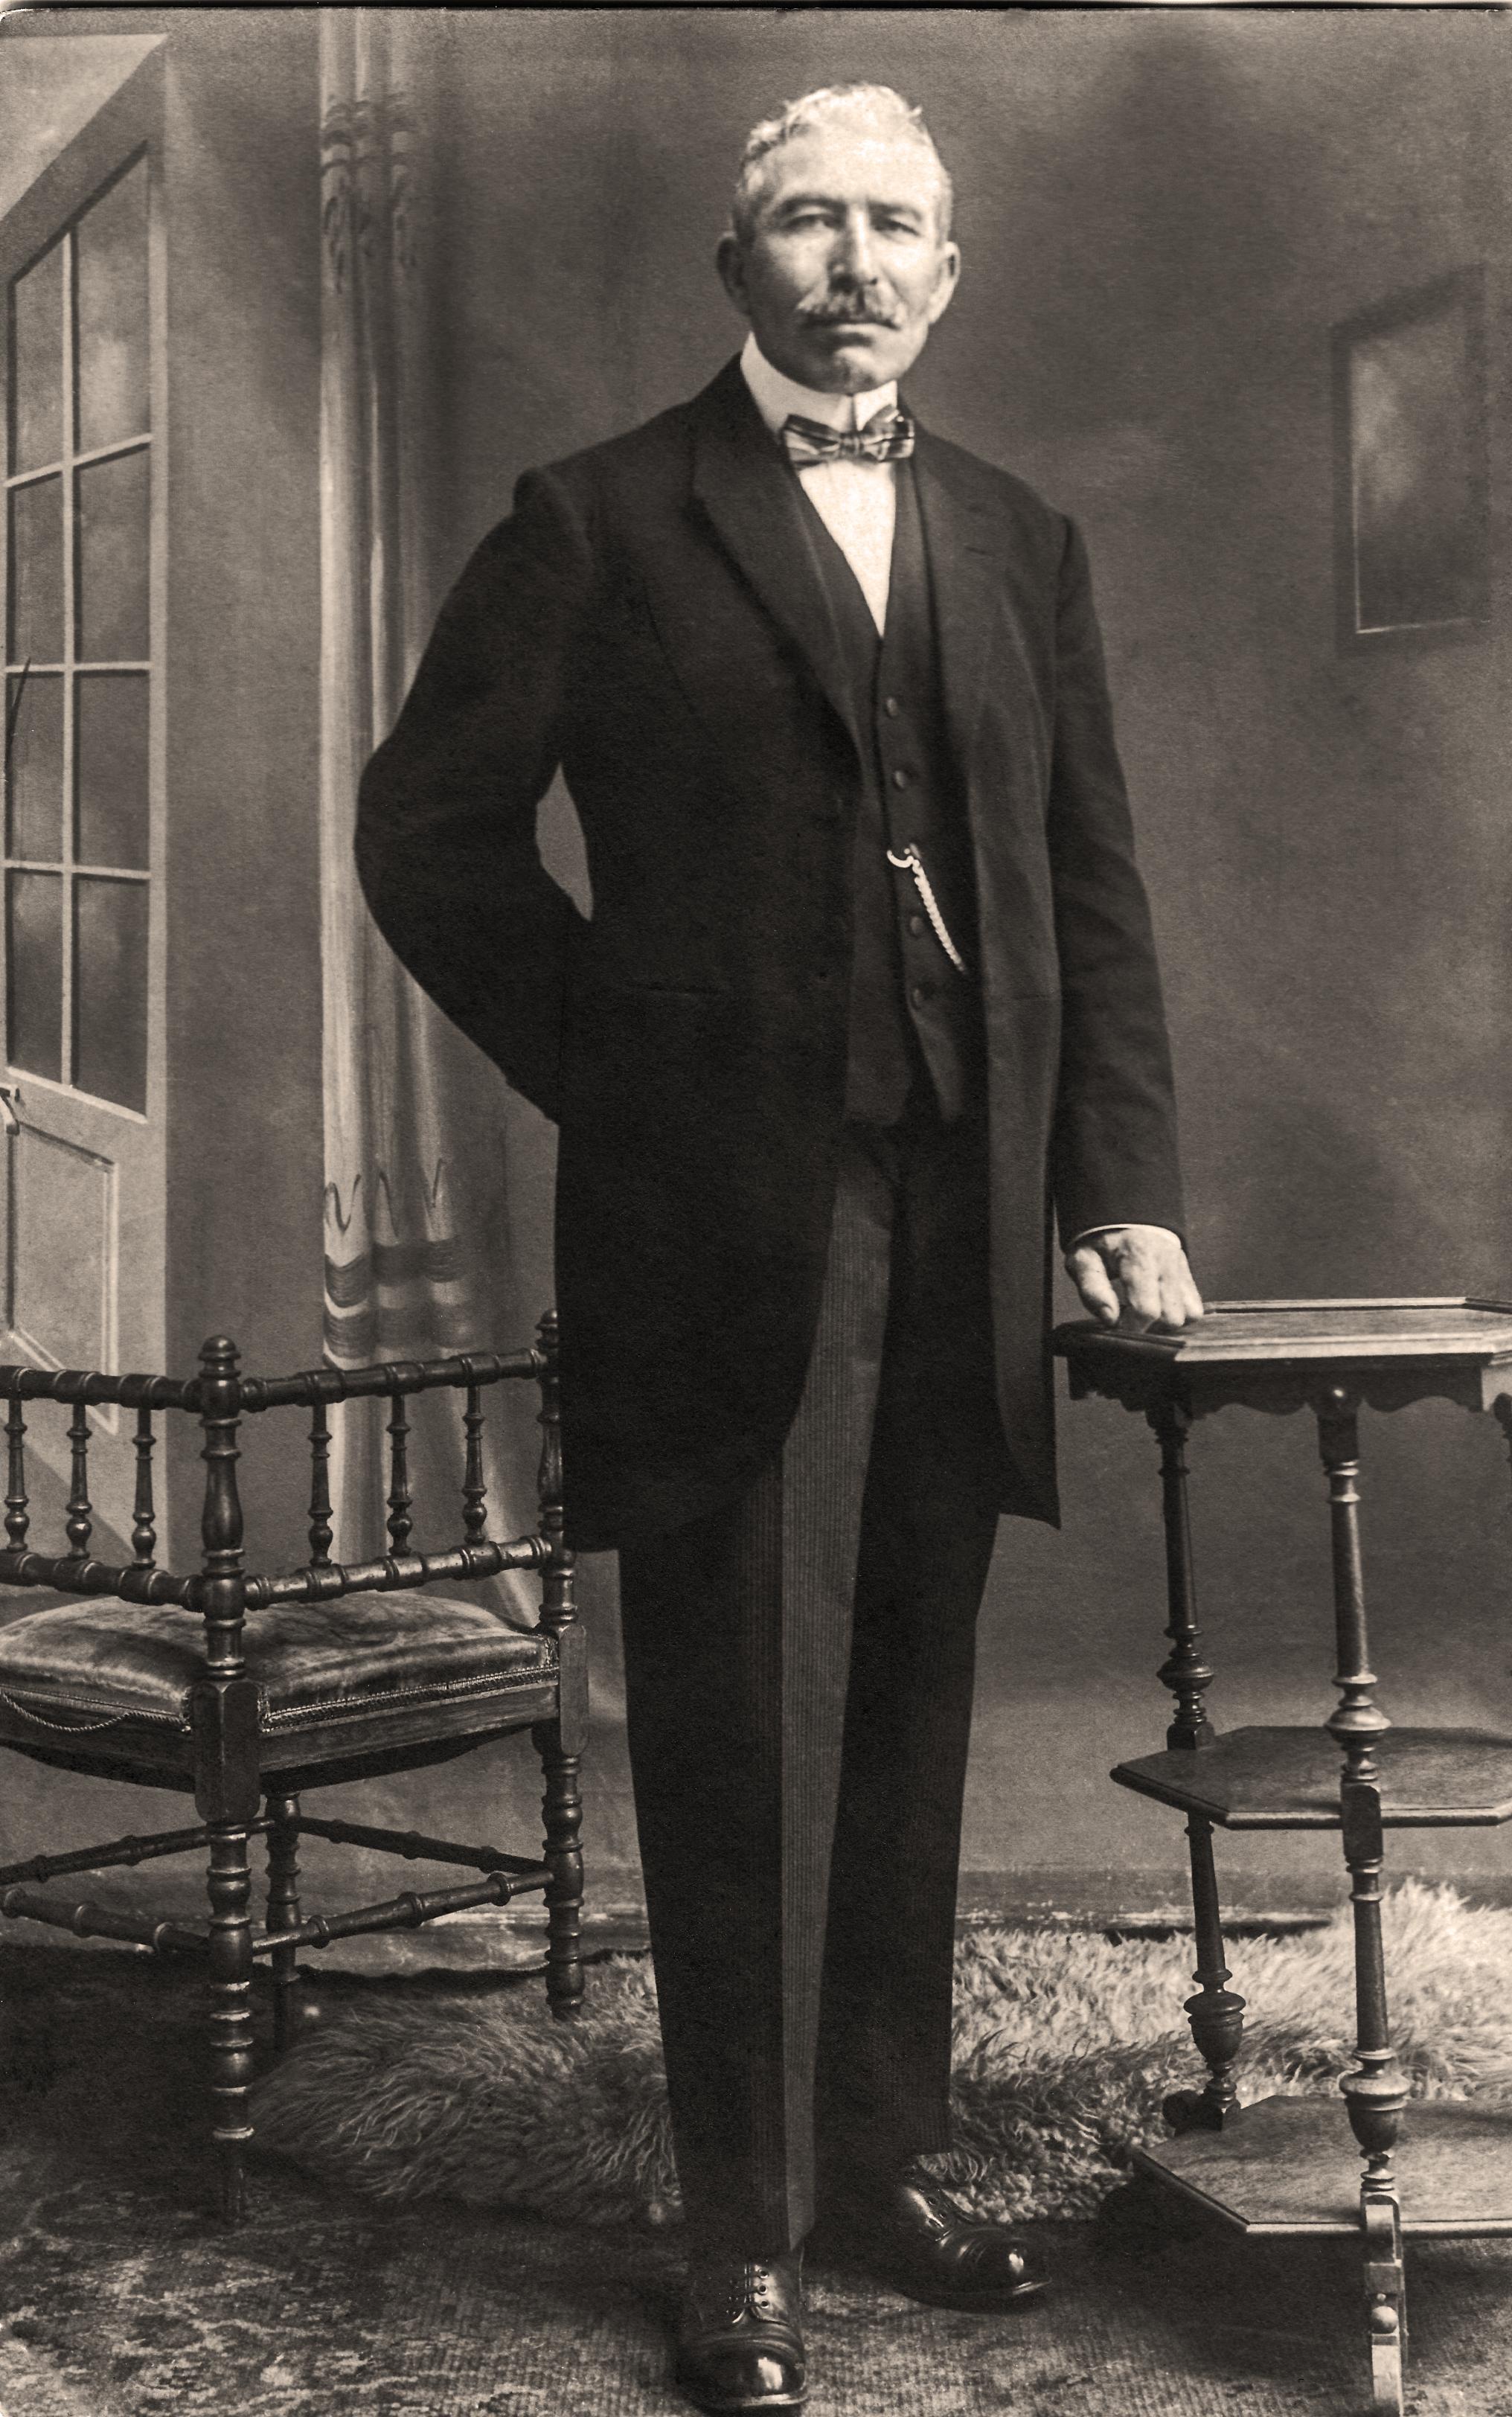 Jan Kasper Heine (1870 - 1952)